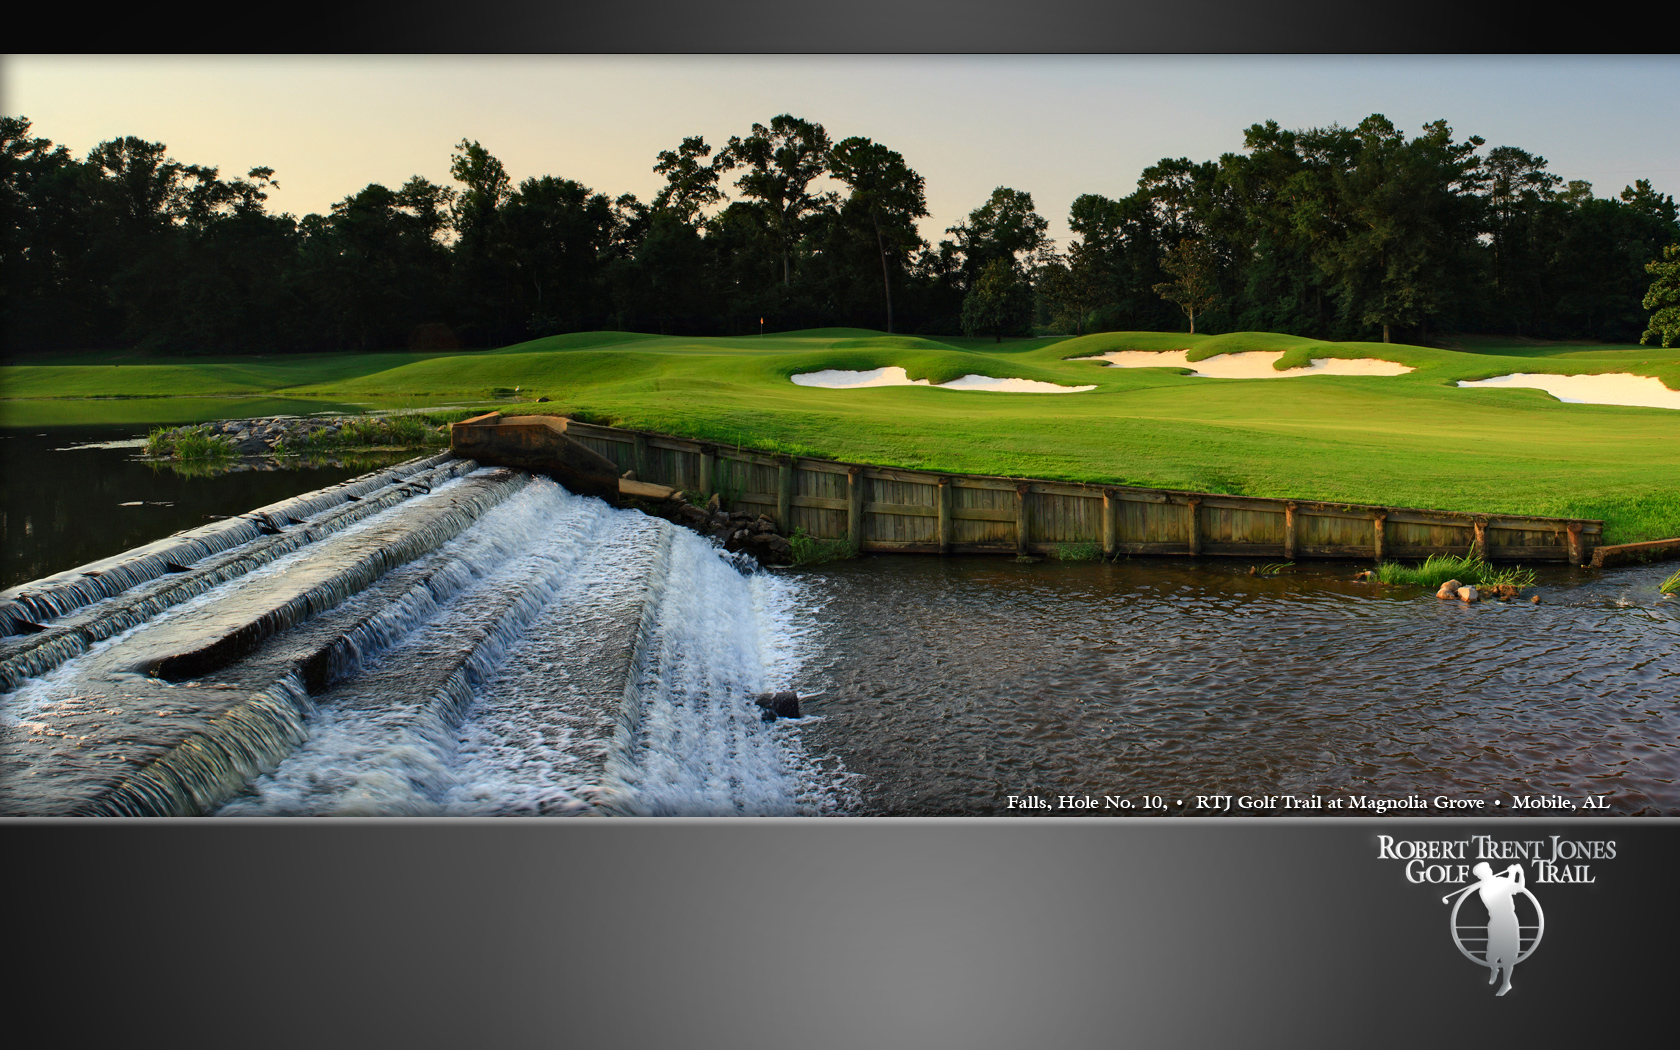 robert trent jones golf trail  u2022 gimmies